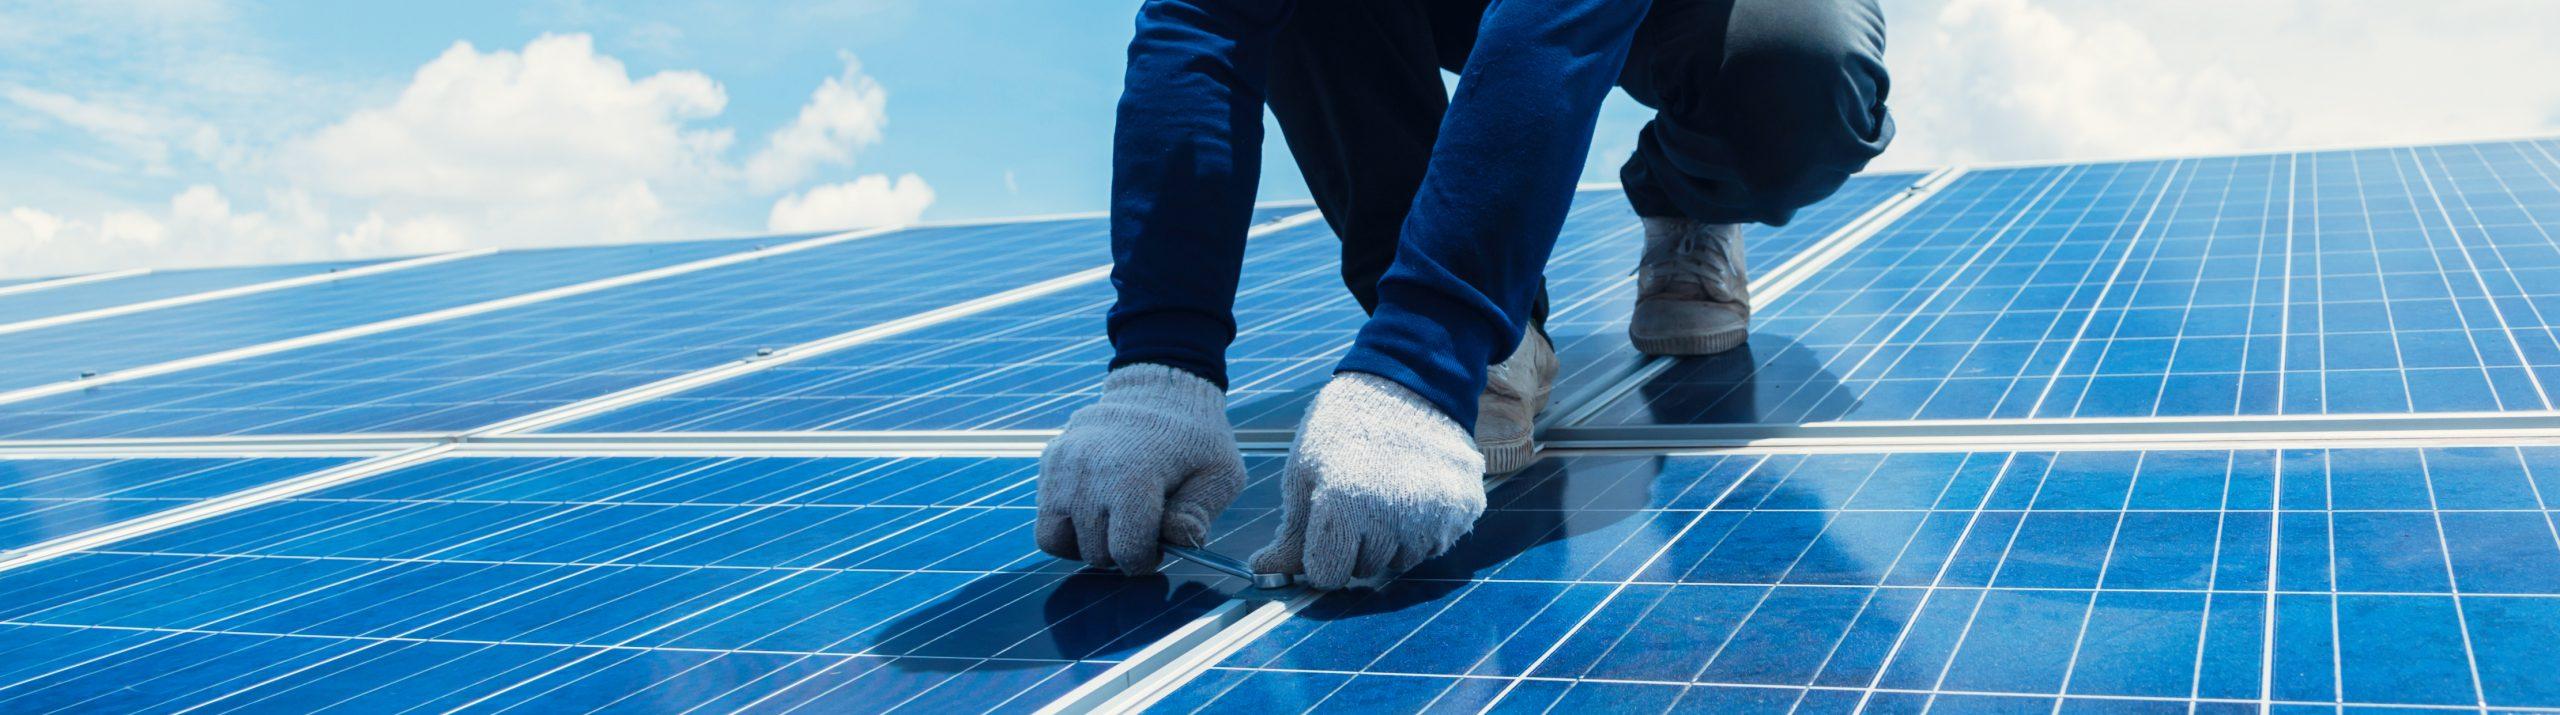 Energie rinnovabili e sistemi energetici